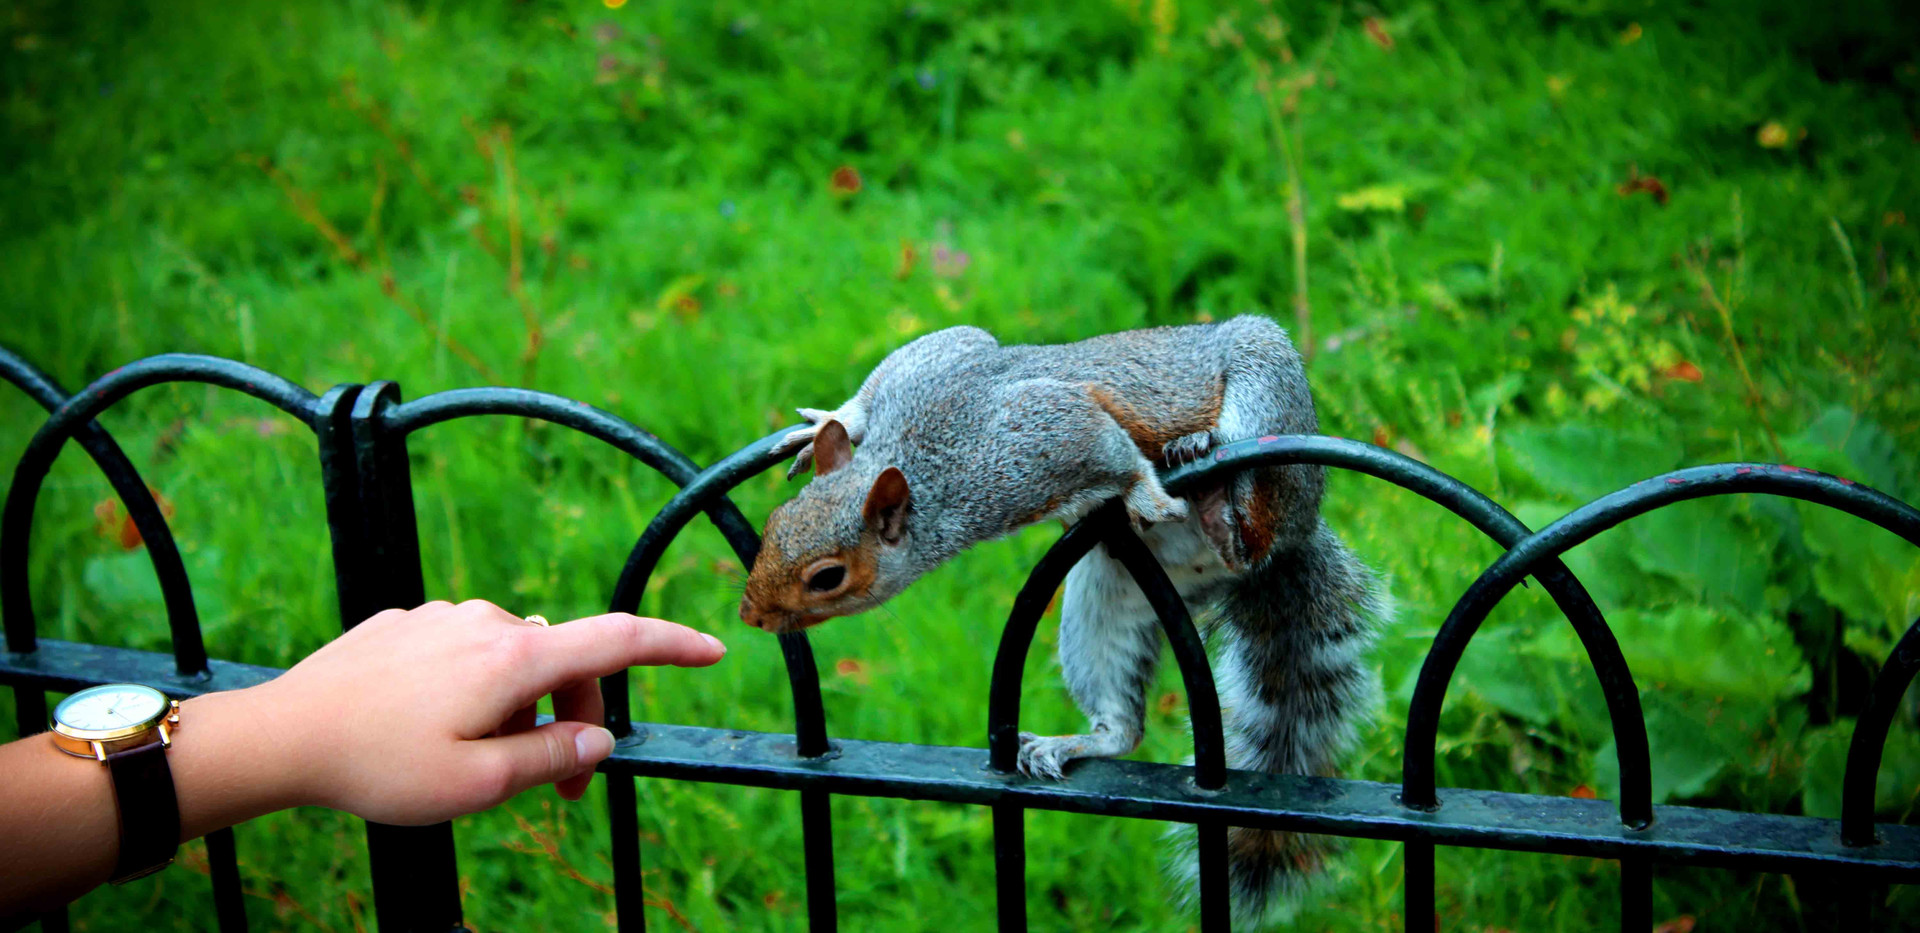 Squirrel in Green Park